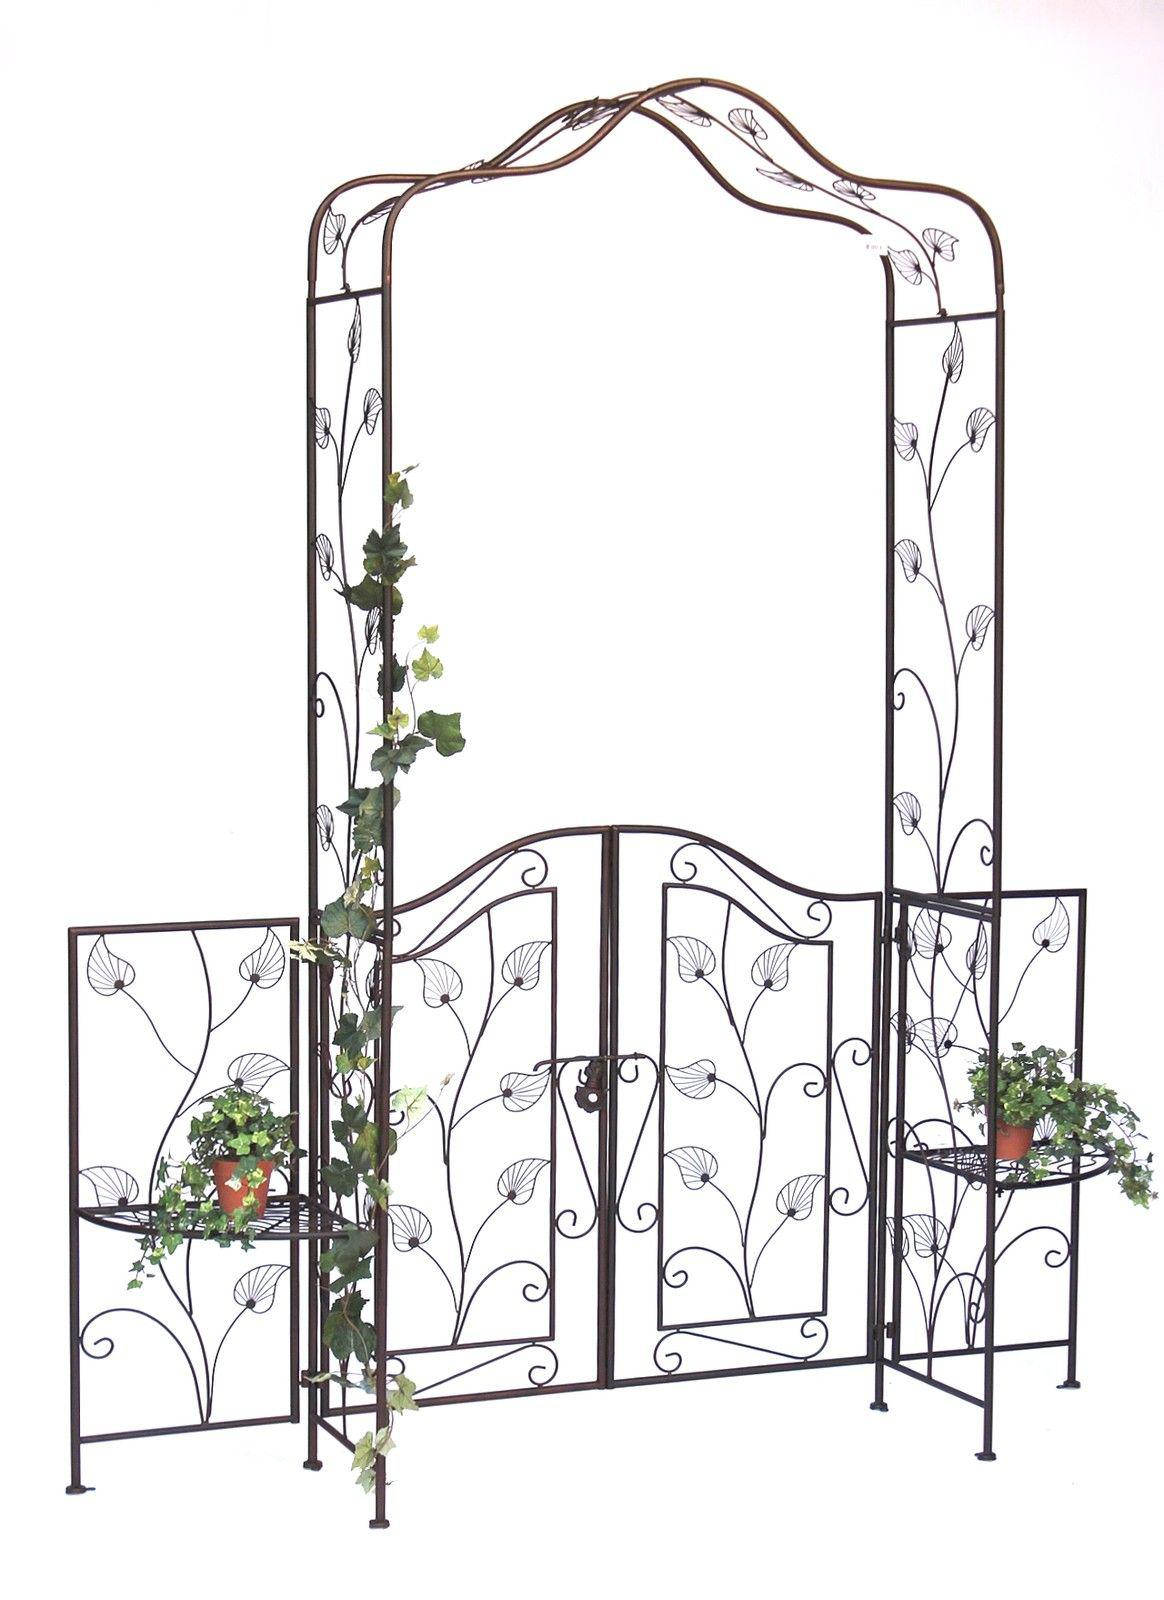 Rosenbogen mit Tor Pforte aus Metall Gartentor 236x186 cm